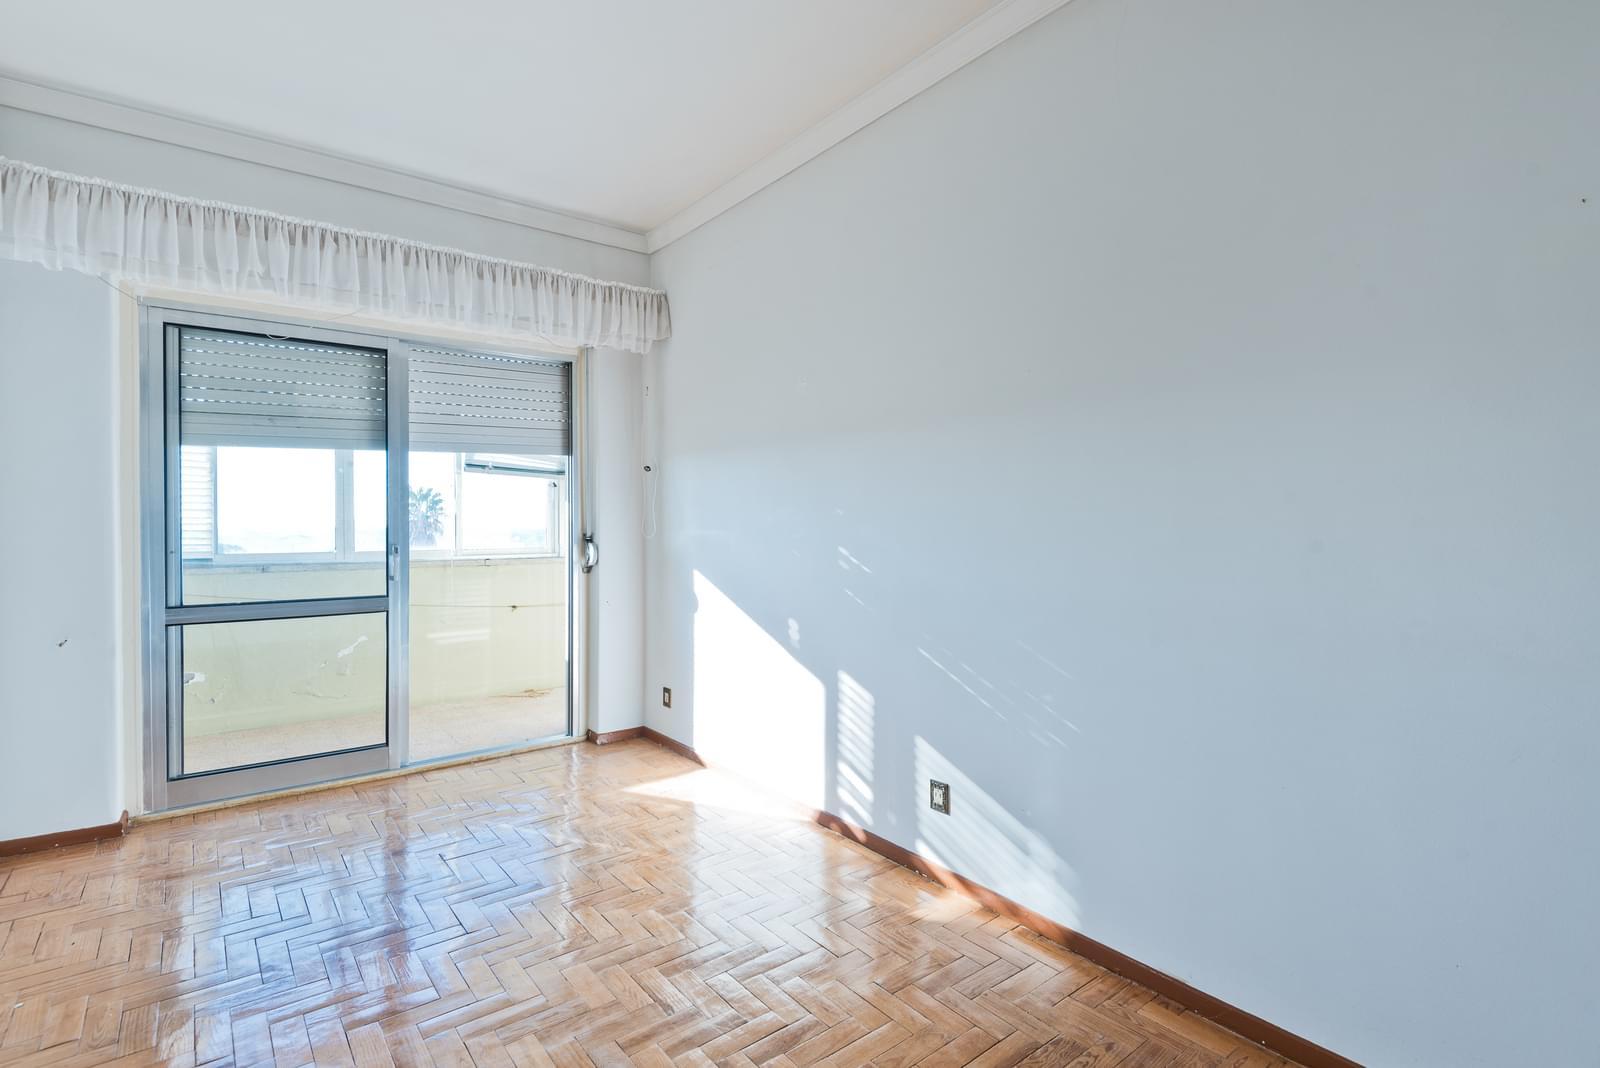 pf18965-apartamento-t2-1-cascais-4c87f20f-1b05-427e-8708-3e6e30f33282